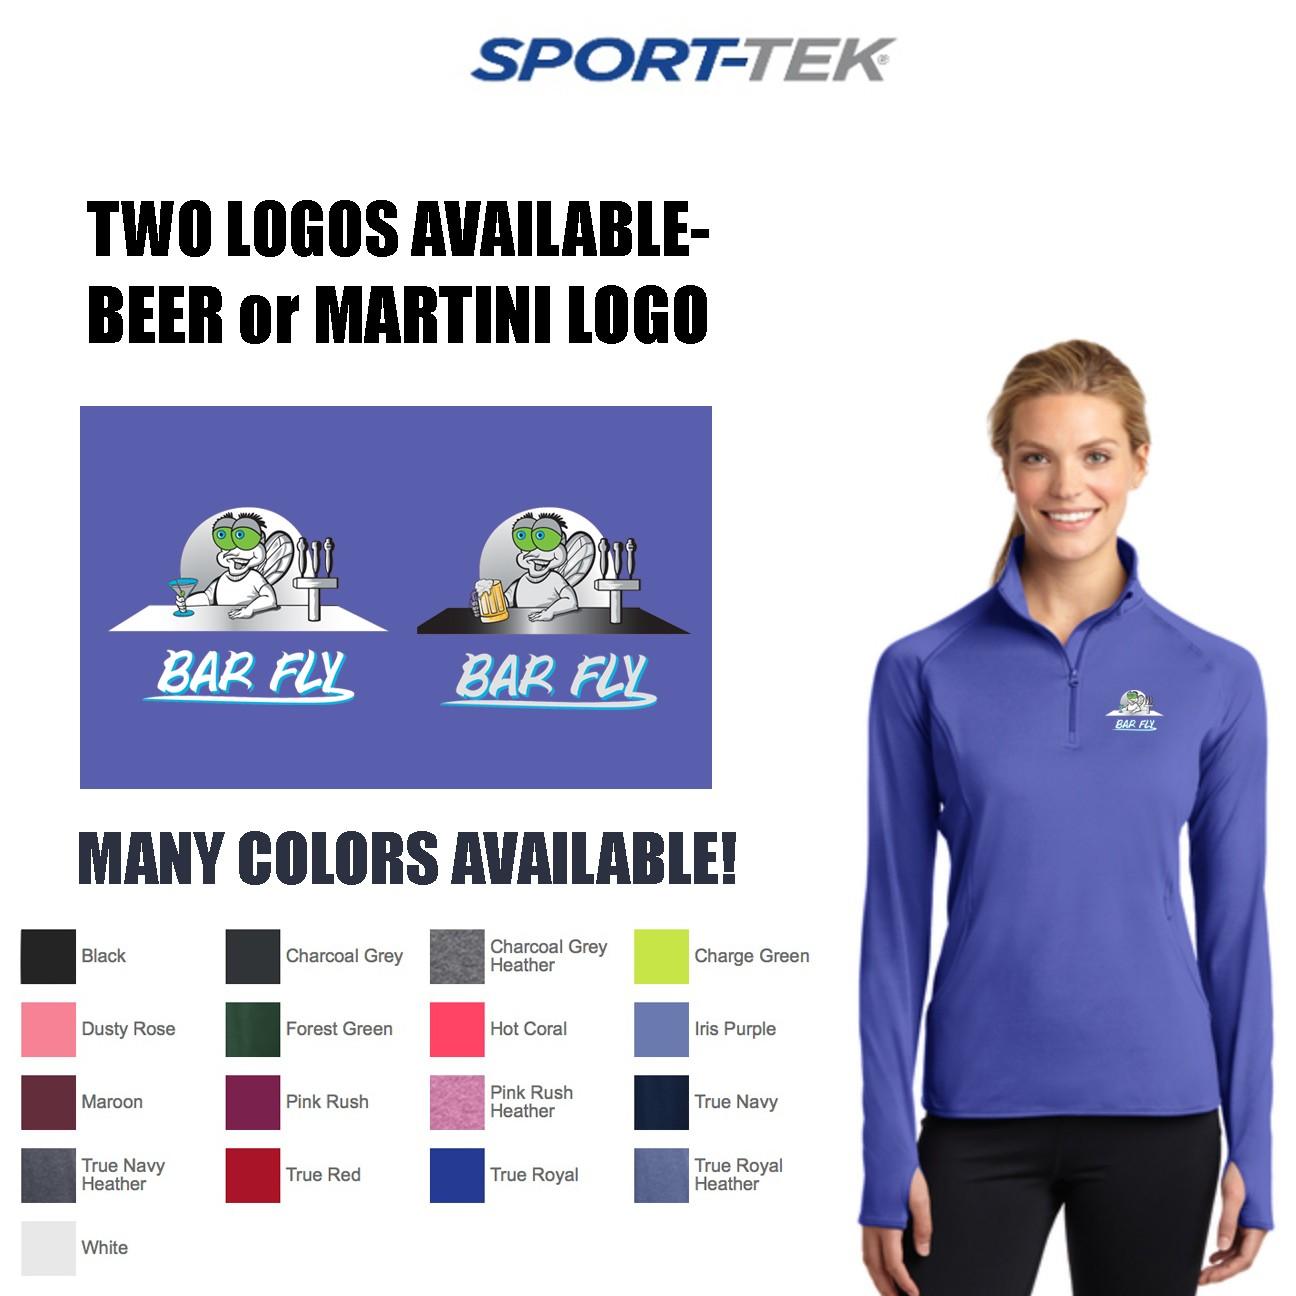 Bar Fly Apparel 1 2 Zip Sport Tek Sport Wick Stretch Pullover Women S Fit Chin guard for additional comfort. bar fly apparel 1 2 zip sport tek sport